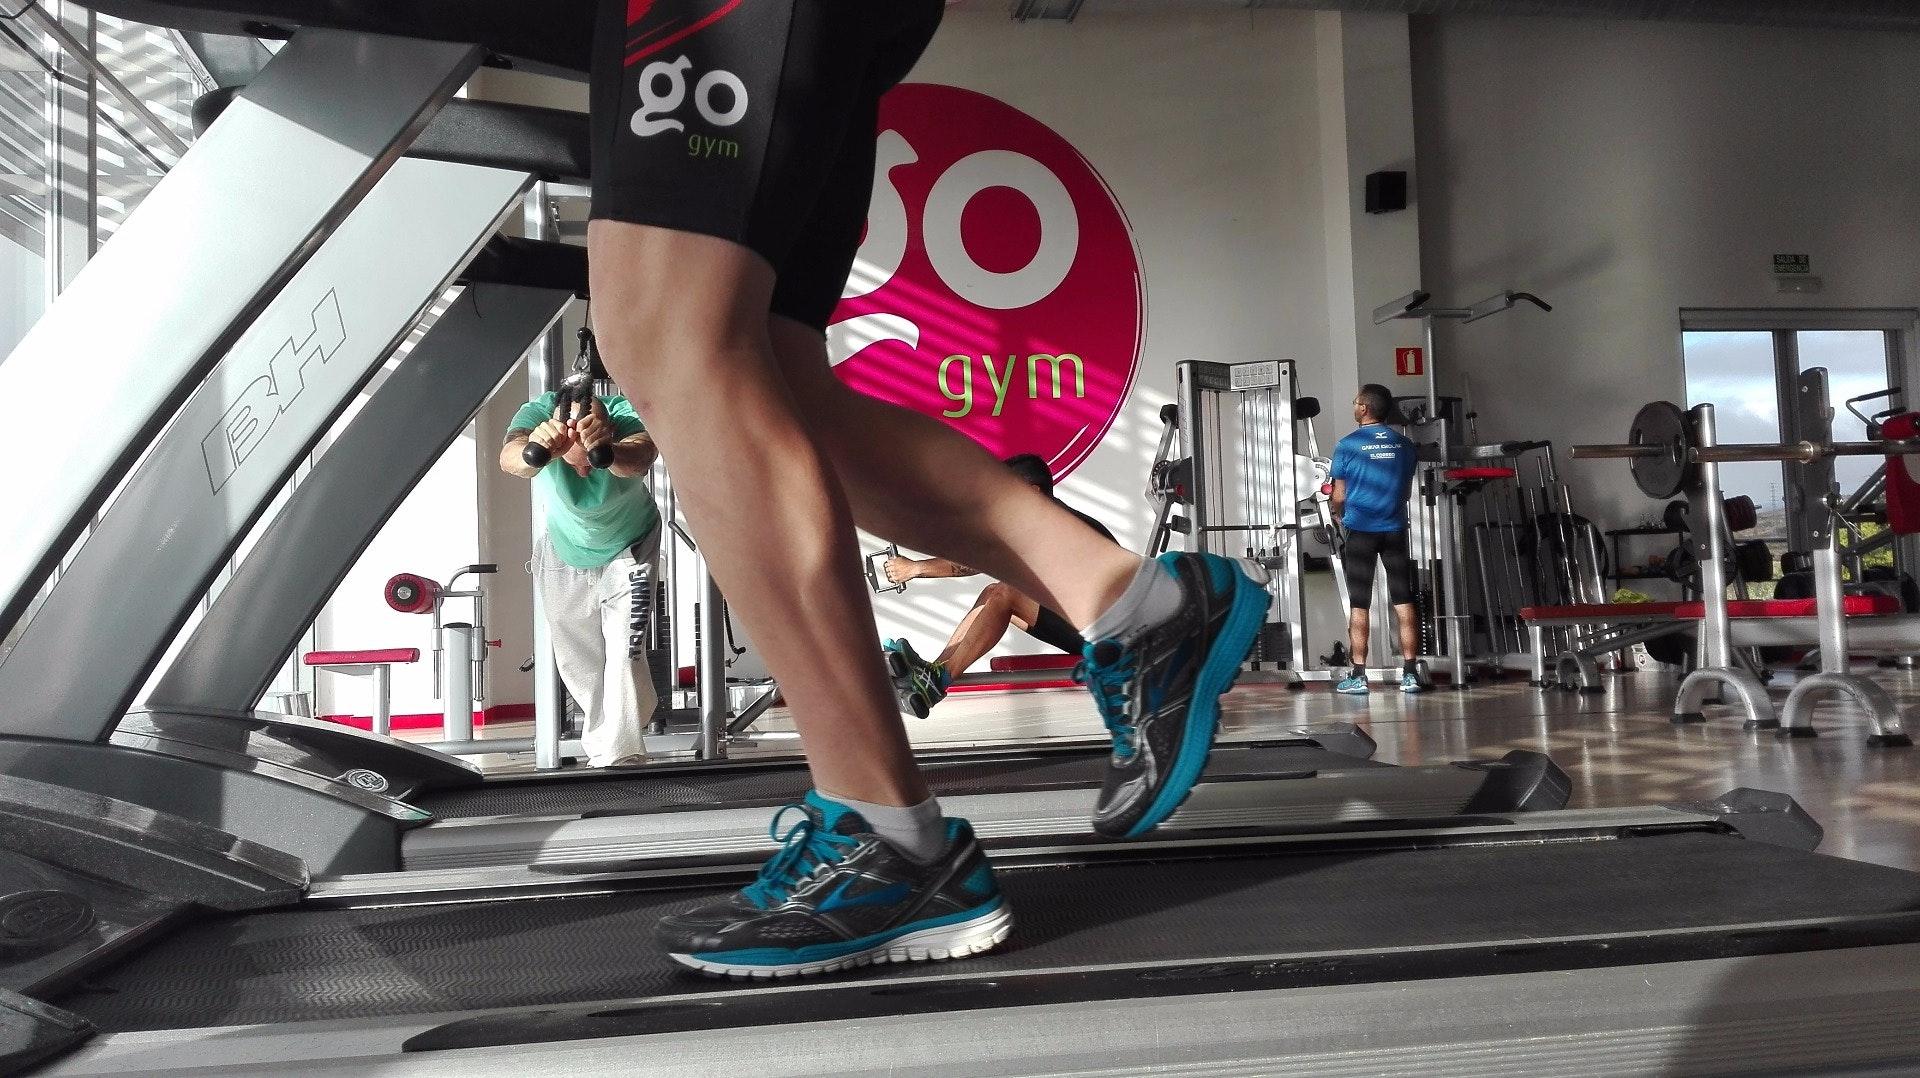 Foto 0 Oferta GO GYM Vitoria-Gasteiz {2} - GymForLess